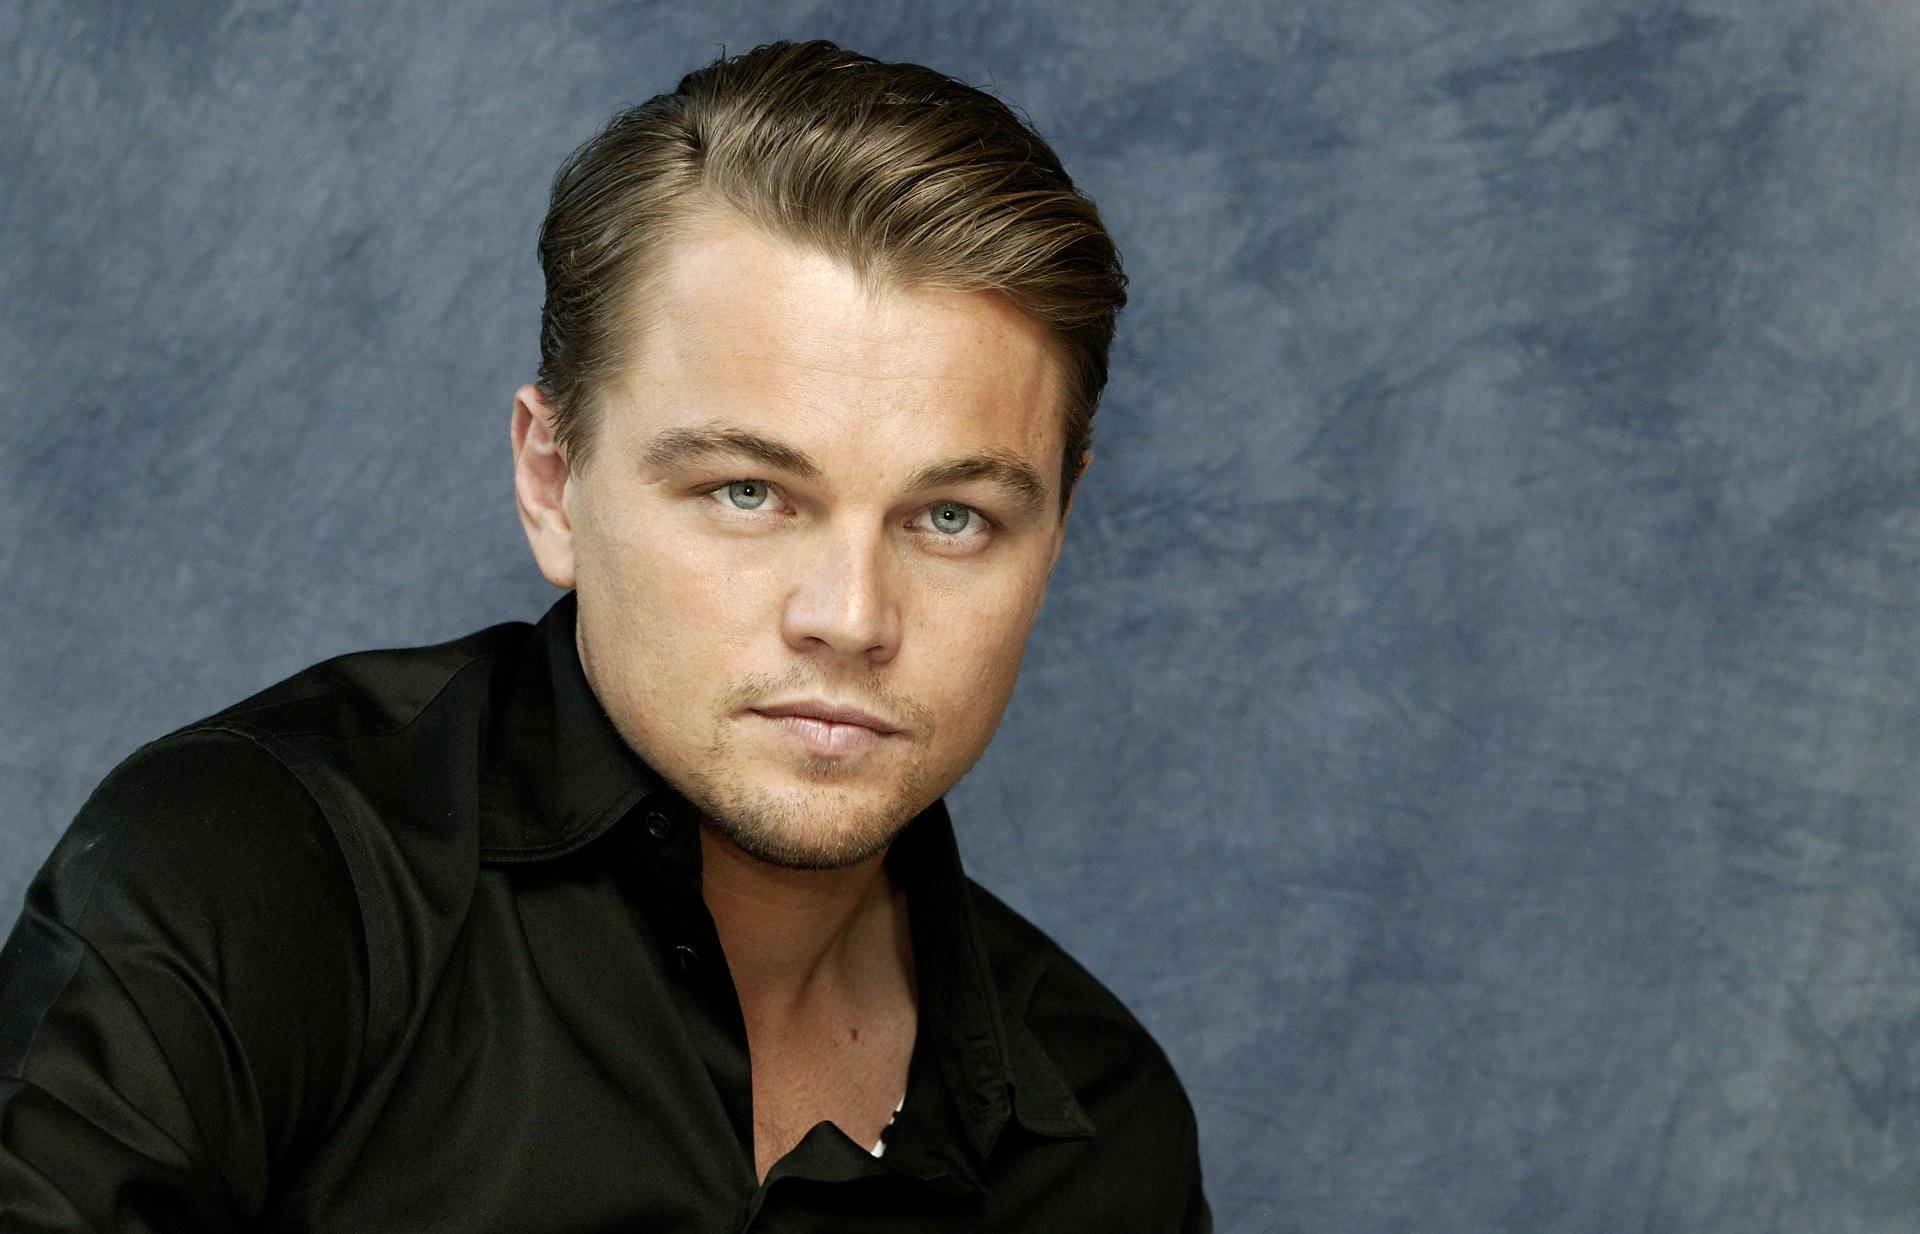 Leonardo DiCaprio Wallpaper 15